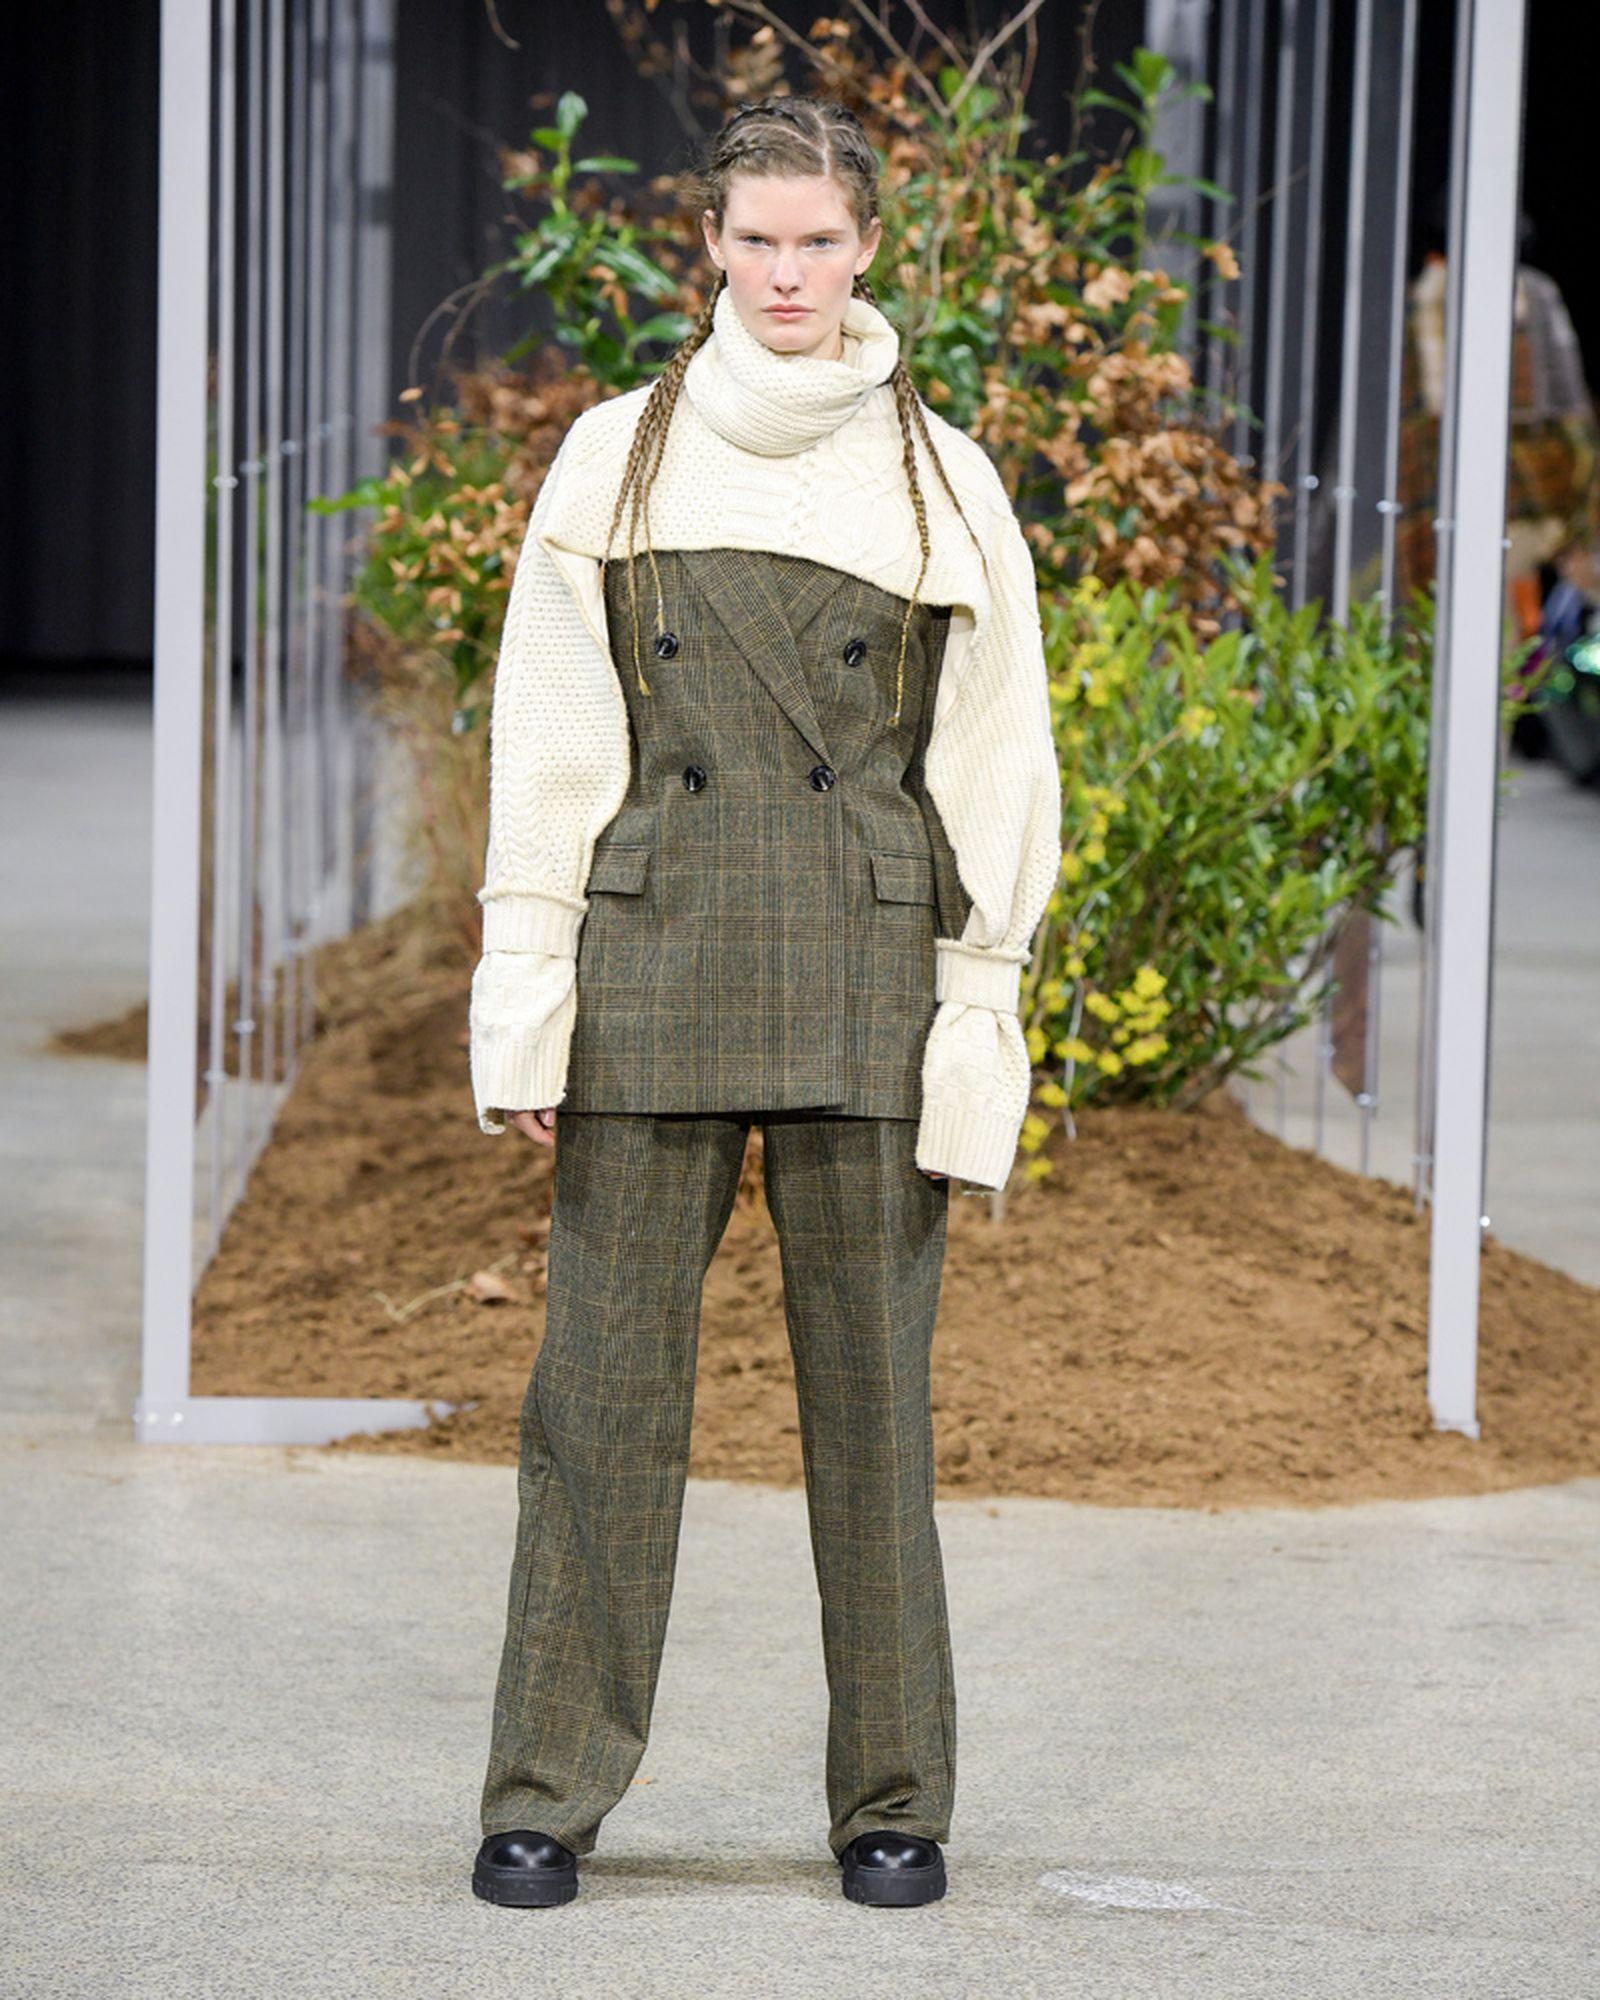 future-fashion-week-copenhagen-holz-5